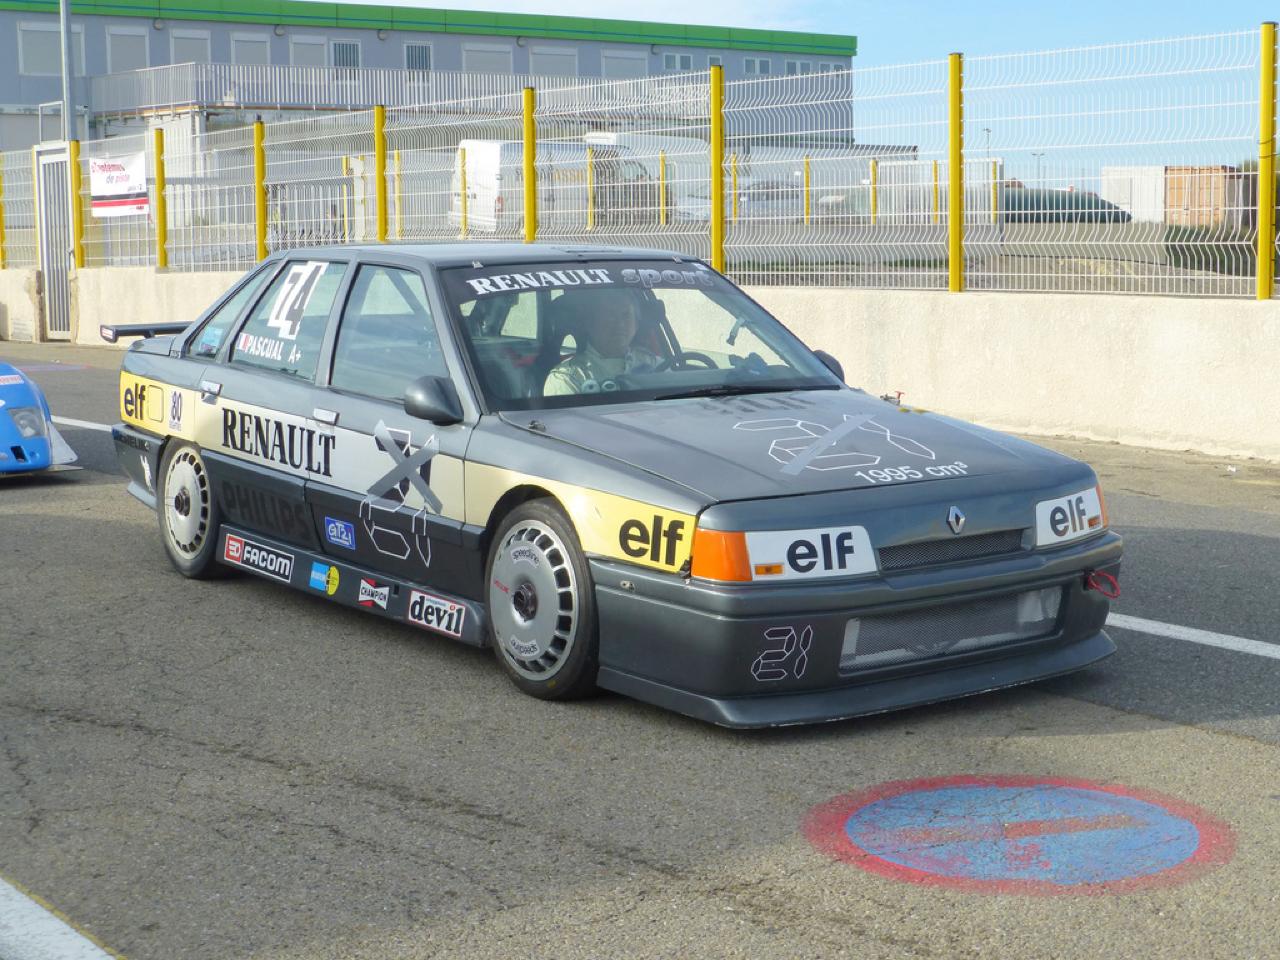 R21 Turbo Europa Cup... Pas si ringarde que ça ! 6